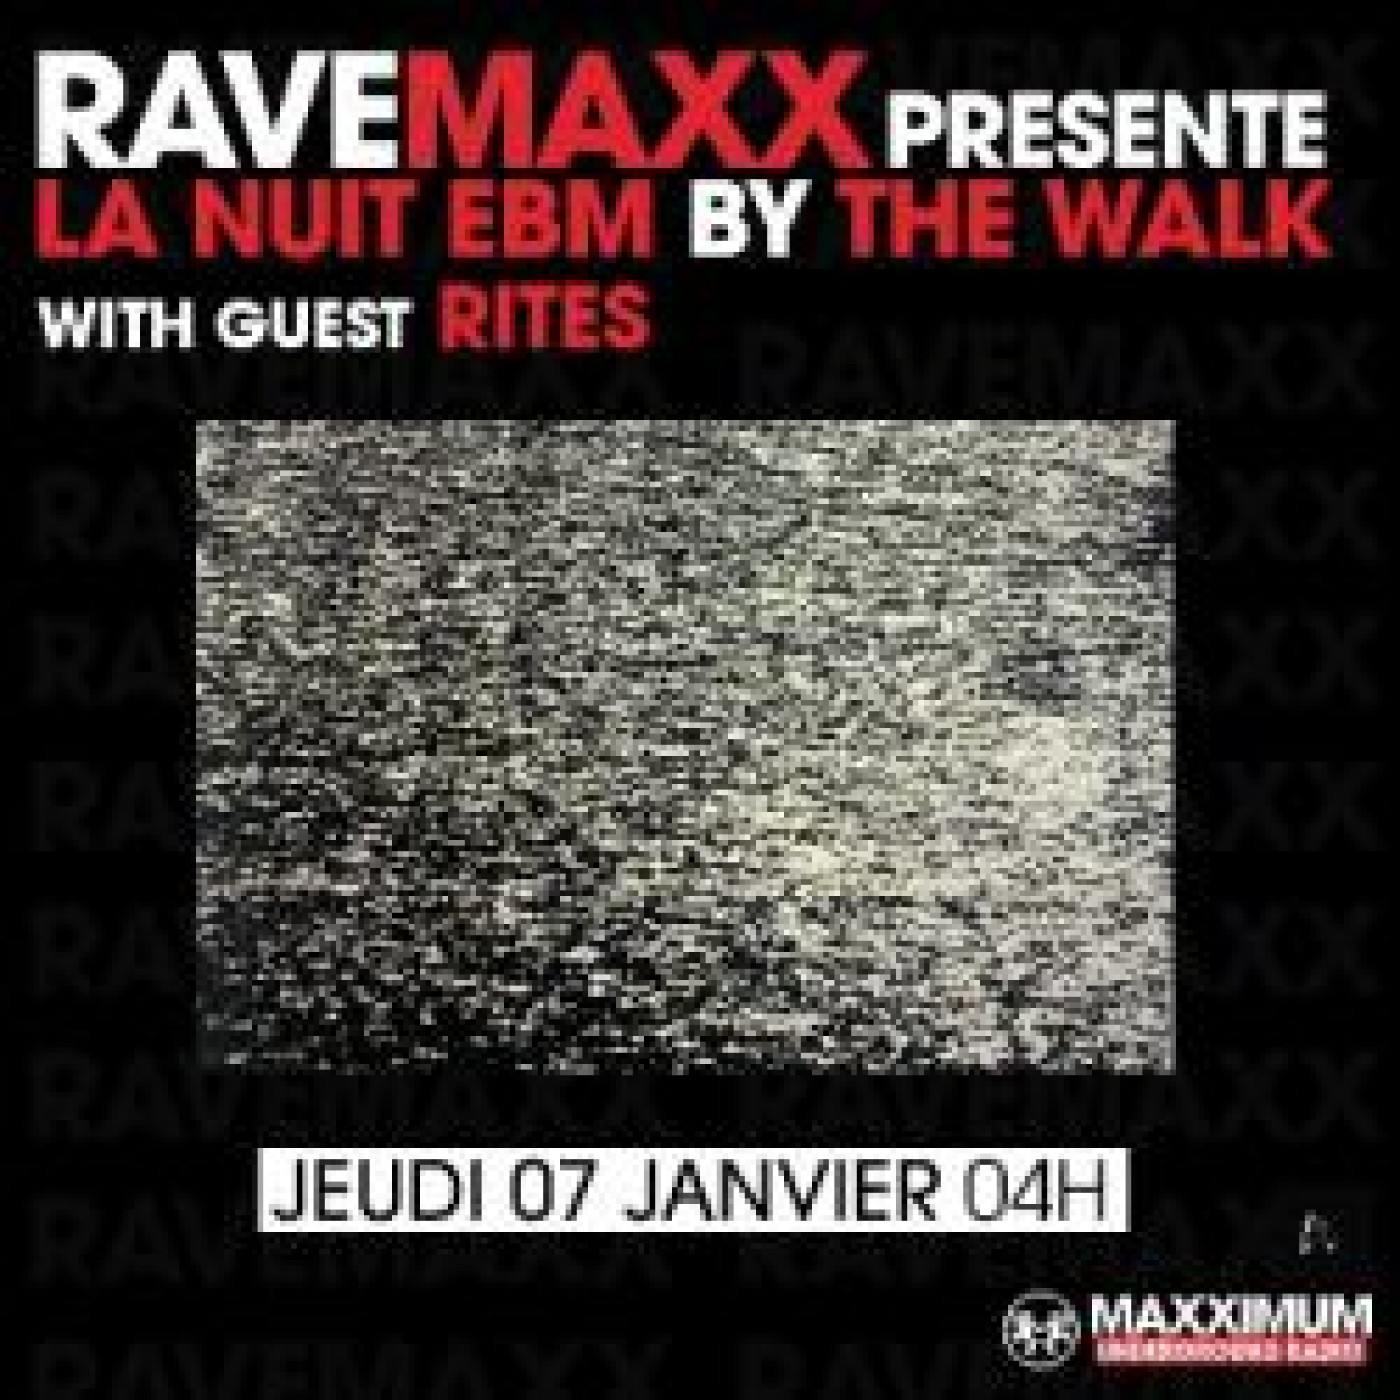 RAVEMAXX : RITES